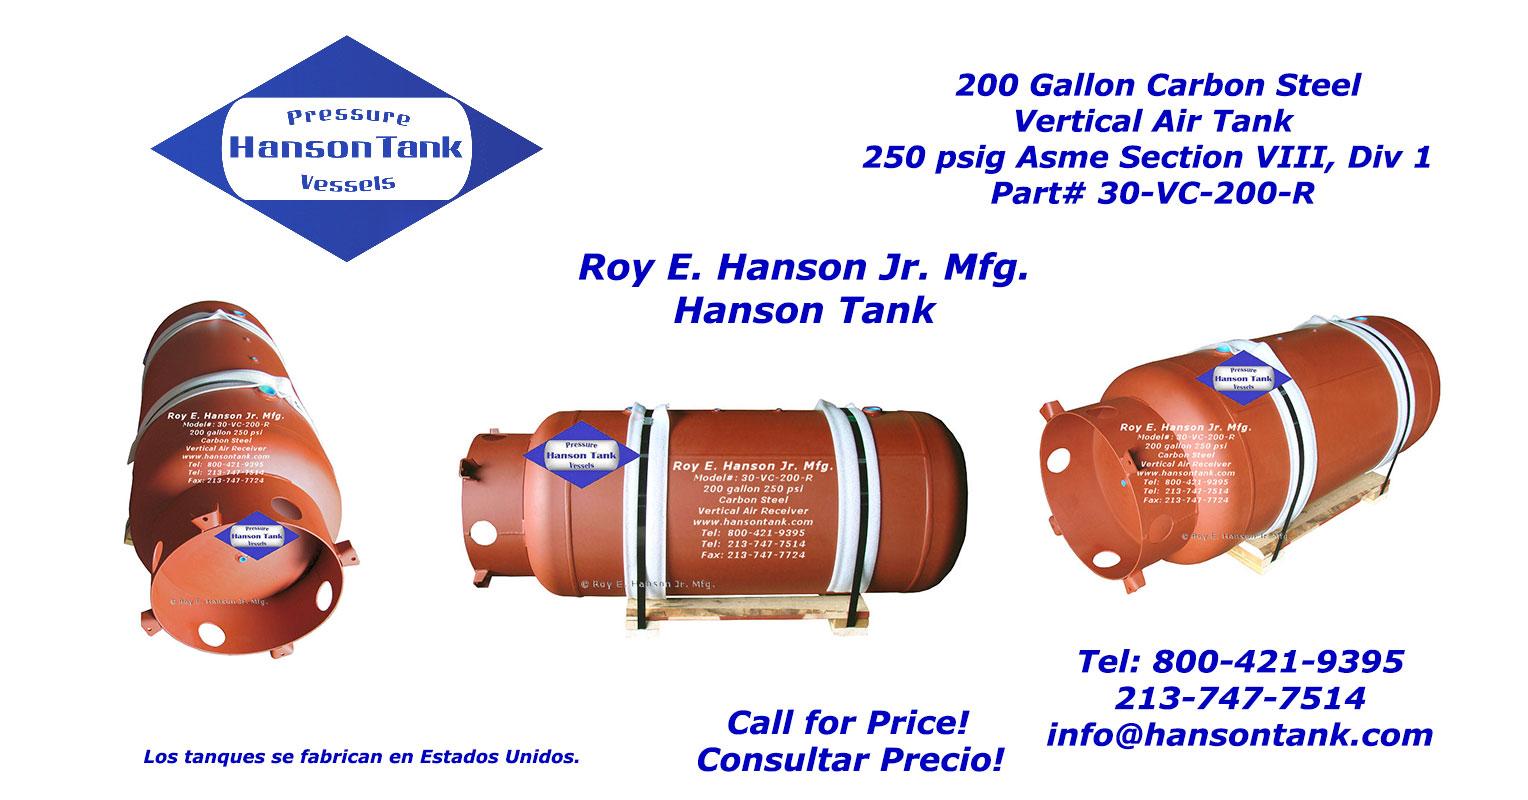 30-VC-200-R Receptor de aire de 200 galones